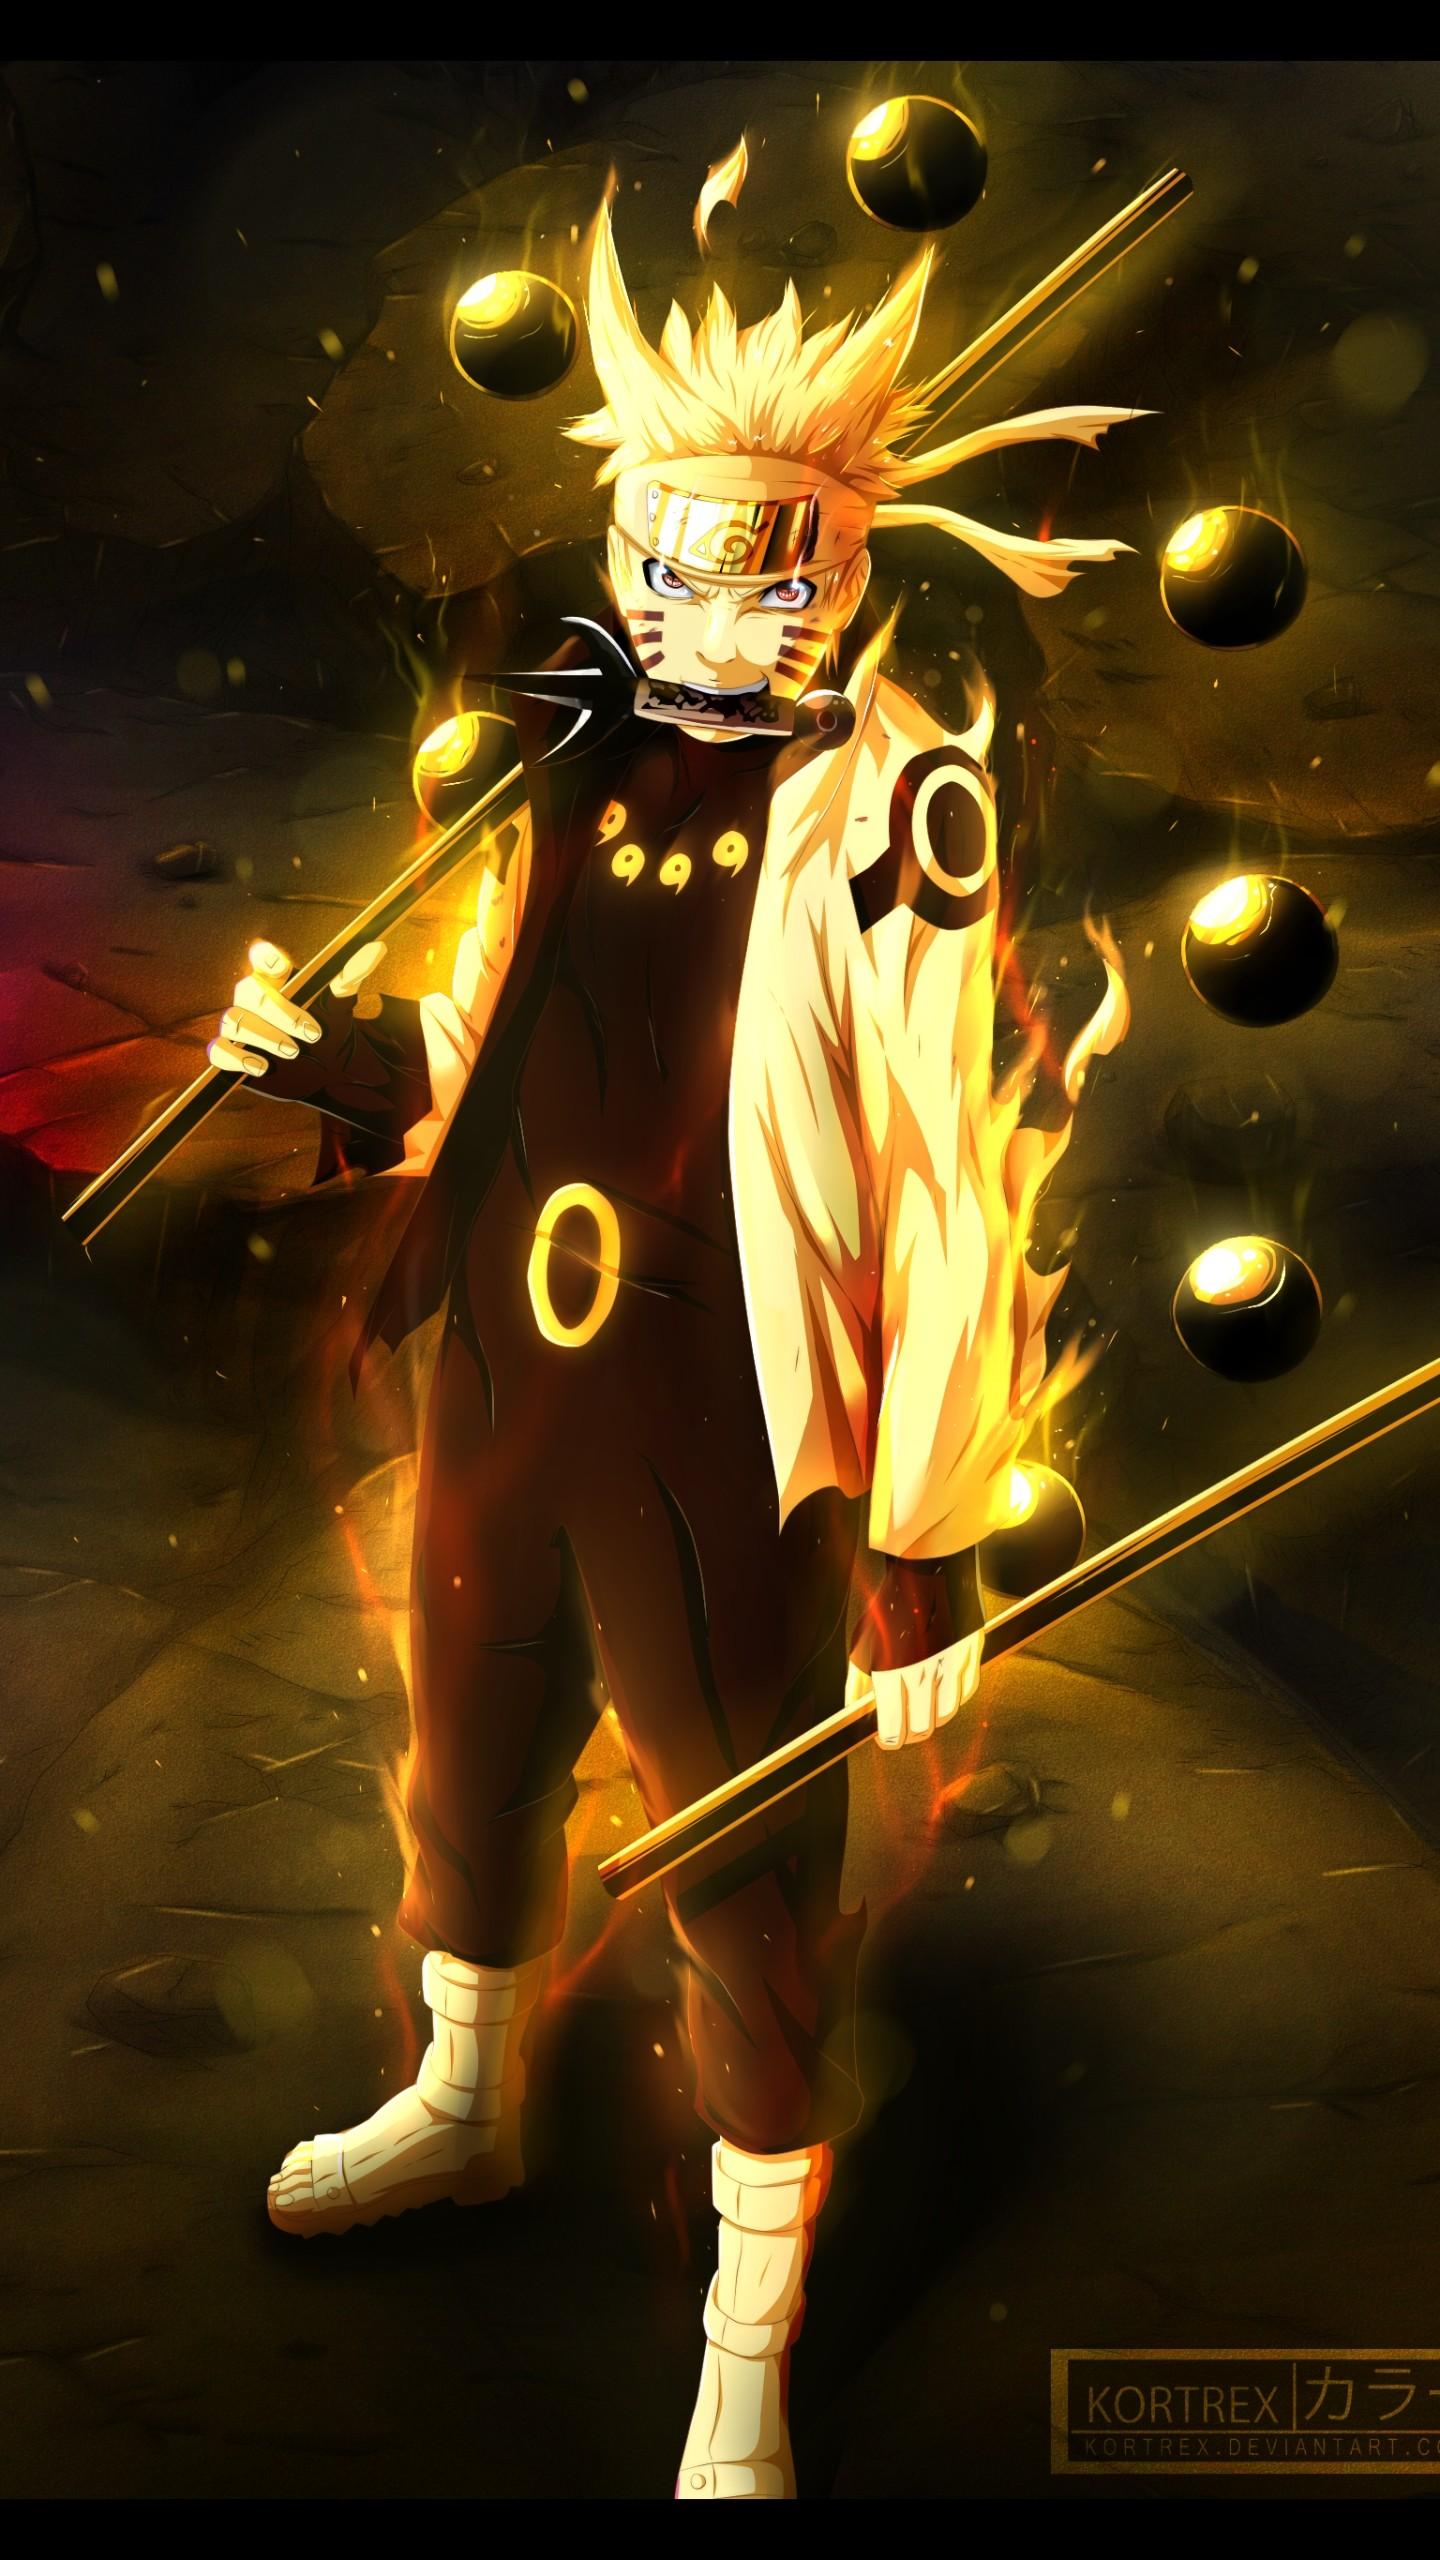 Naruto Shippuden Wallpaper Terbaru 2018 (52+ images)